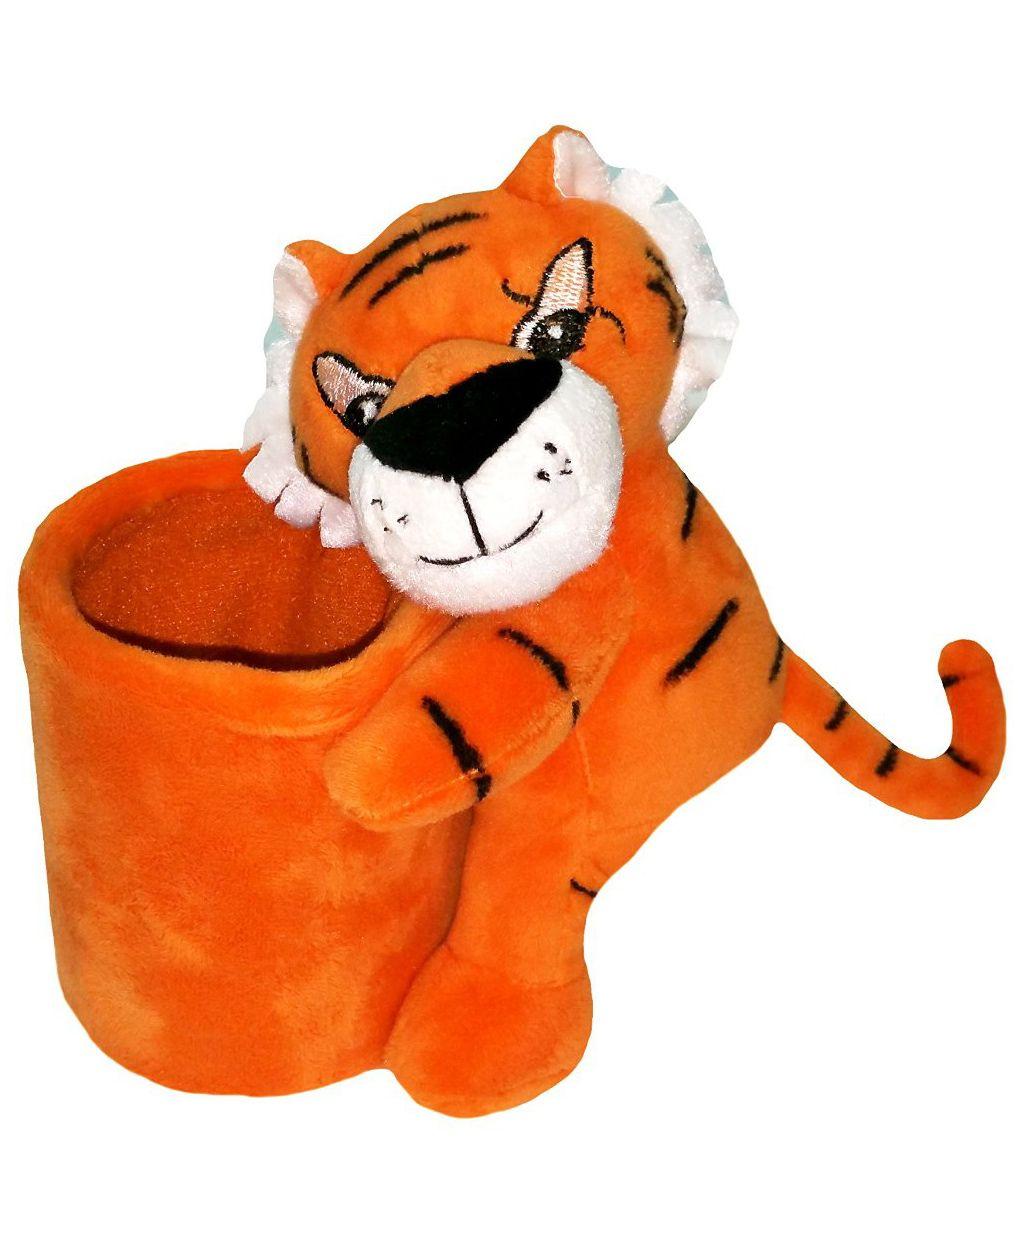 soft buddies jungle book sharekhan plush pen stand orange online in